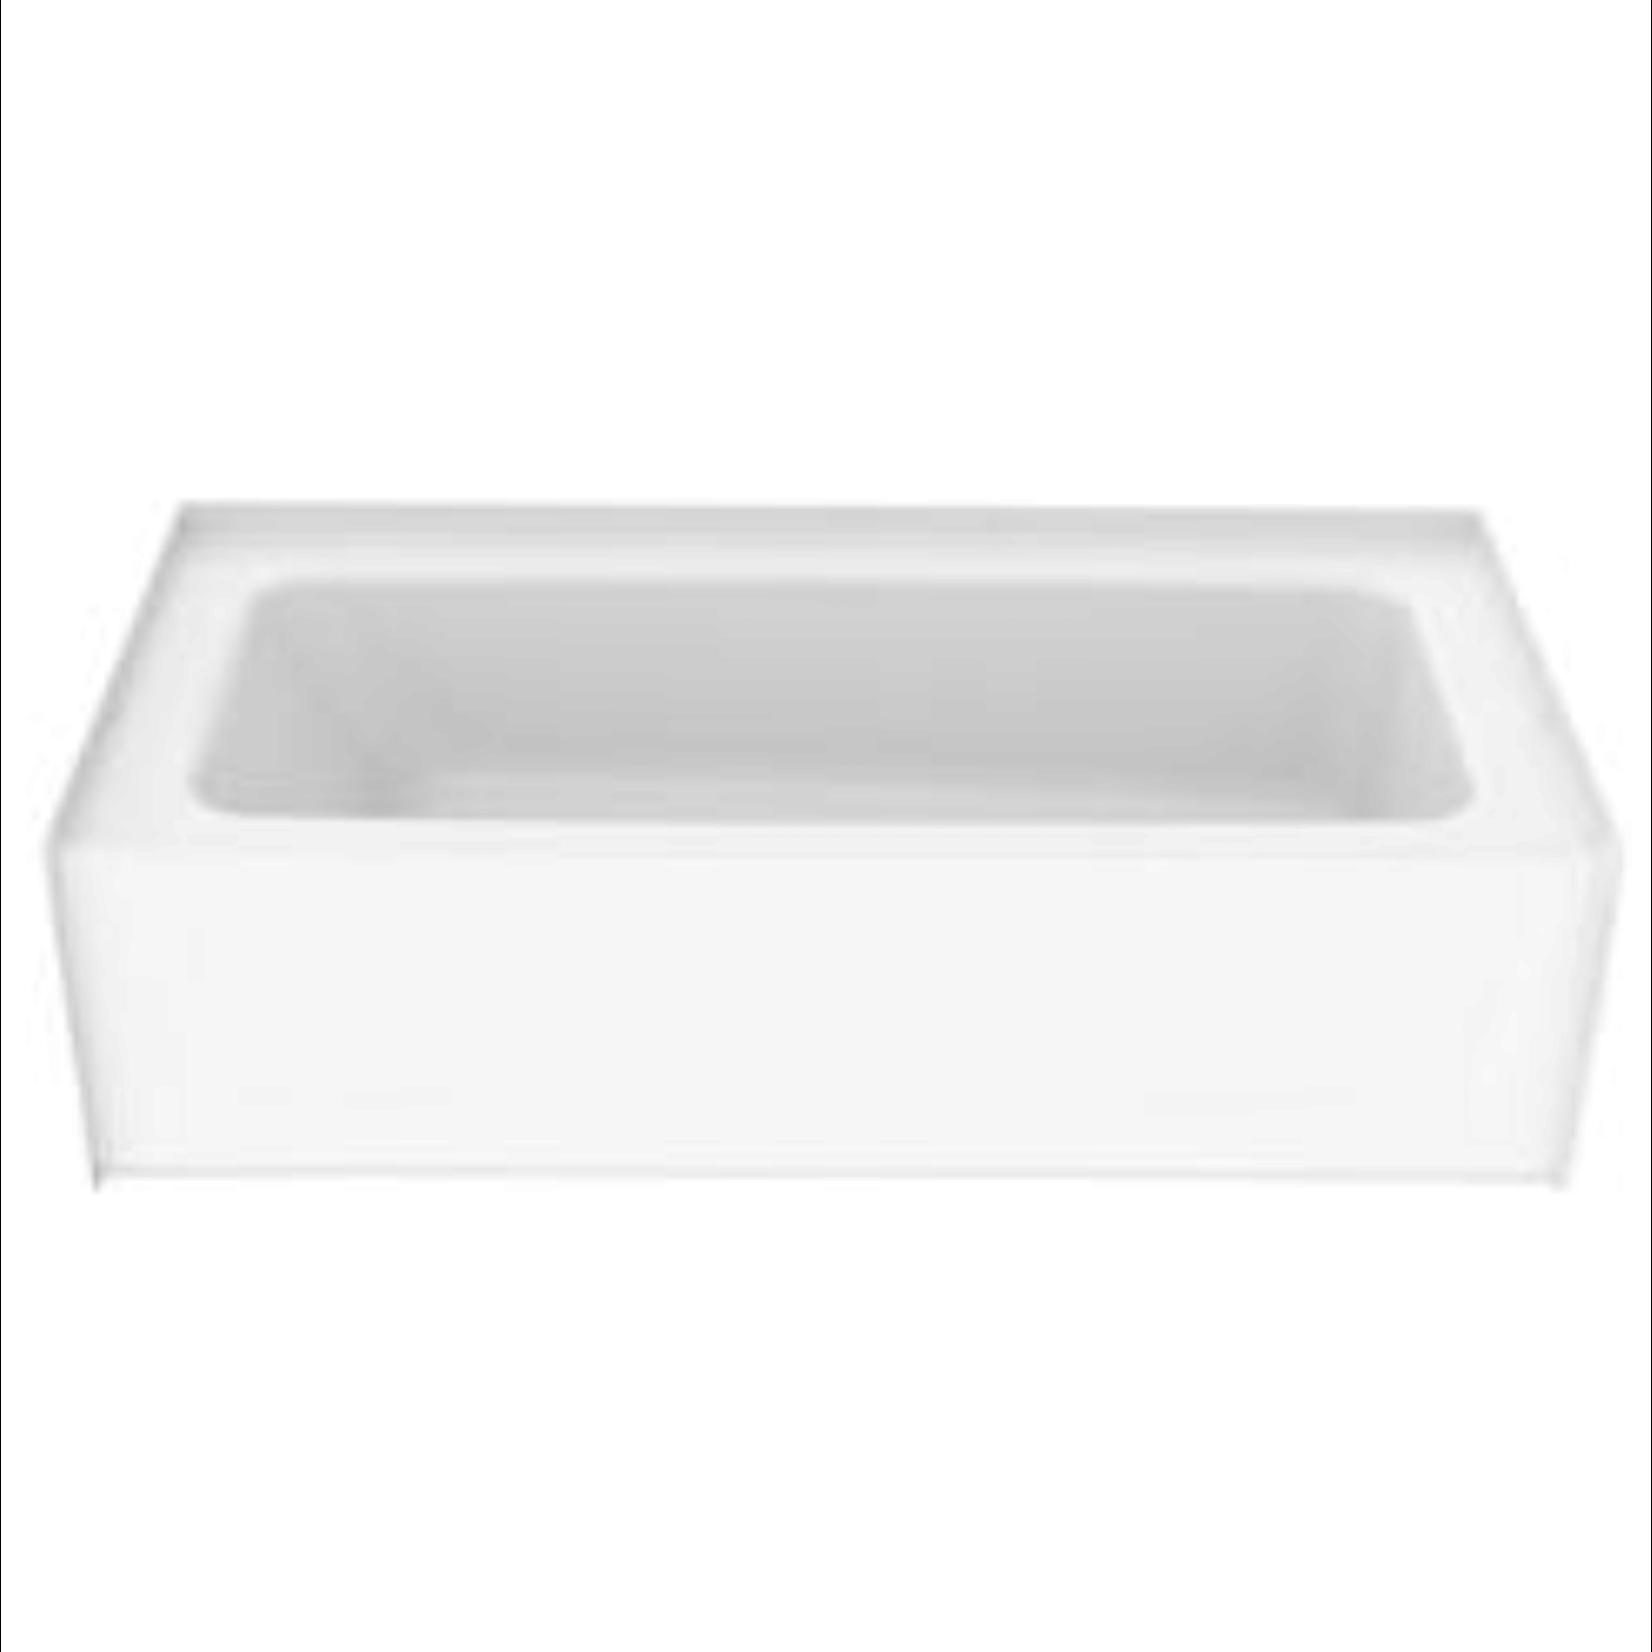 10407 Aquatic White Bathtub and Shower Surround